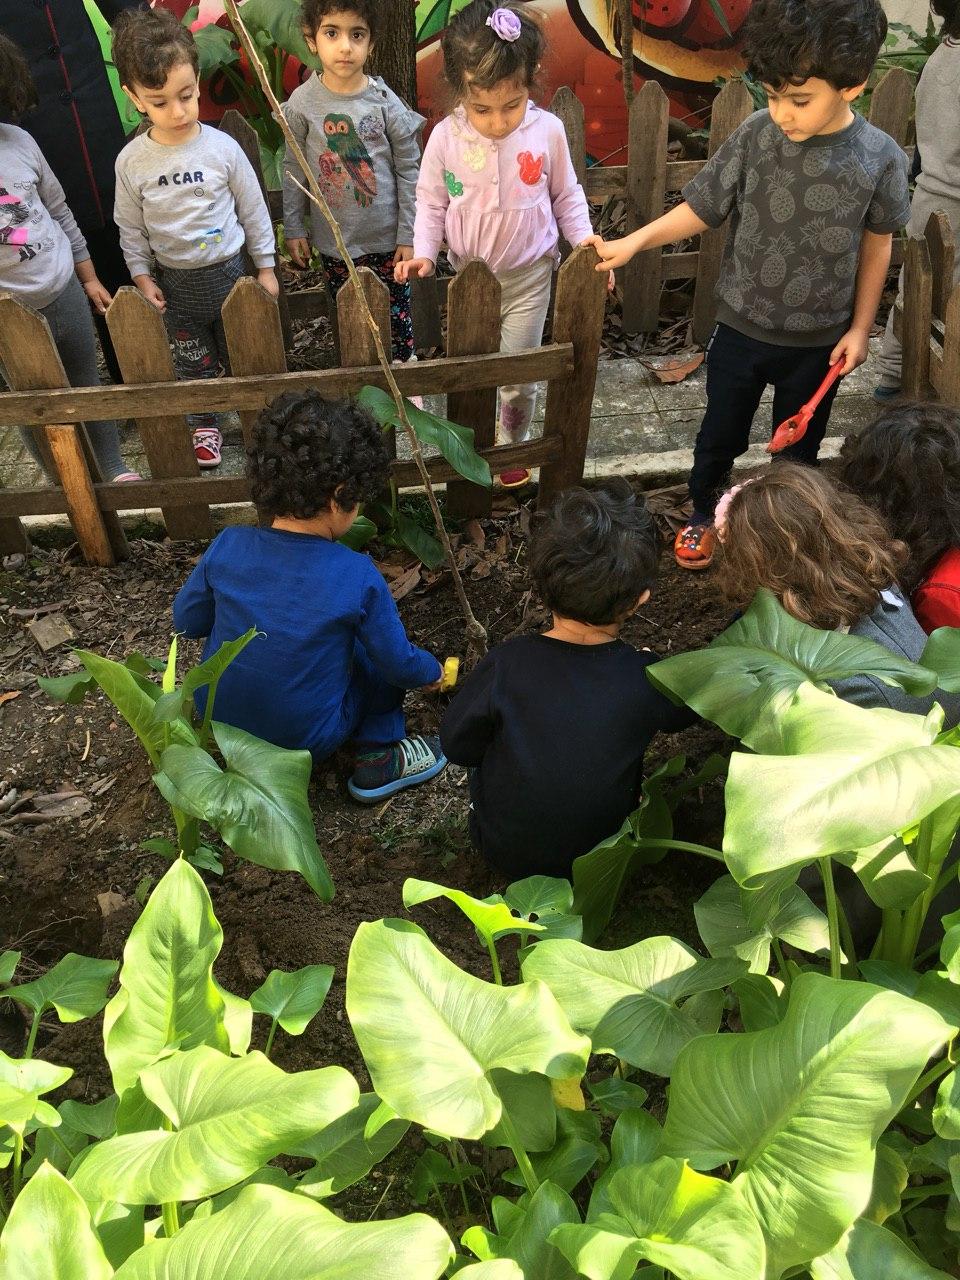 کاشت نهال توسط کودکان مهدکودک کندوی عسل عضو فعال کارگروه کودک ، نوجوان انجمن بوم بانان گیل و دیلم